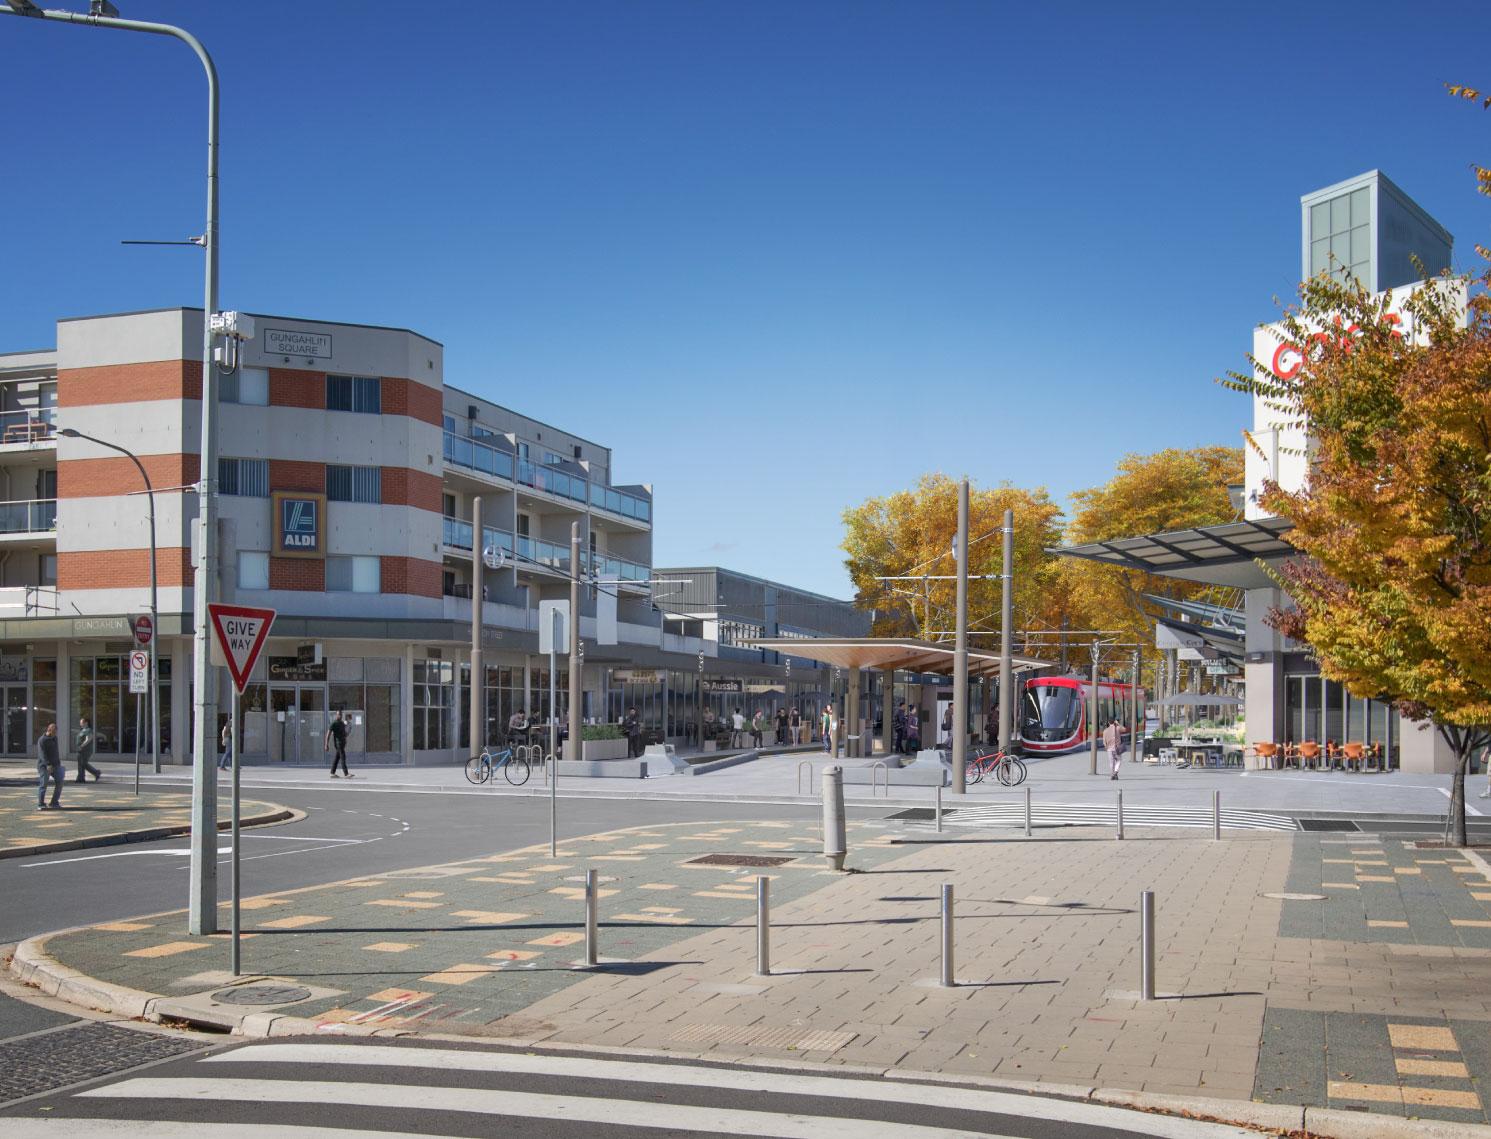 Studio-Colin-Polwarth-Canberra-Light-Rail (15).jpg